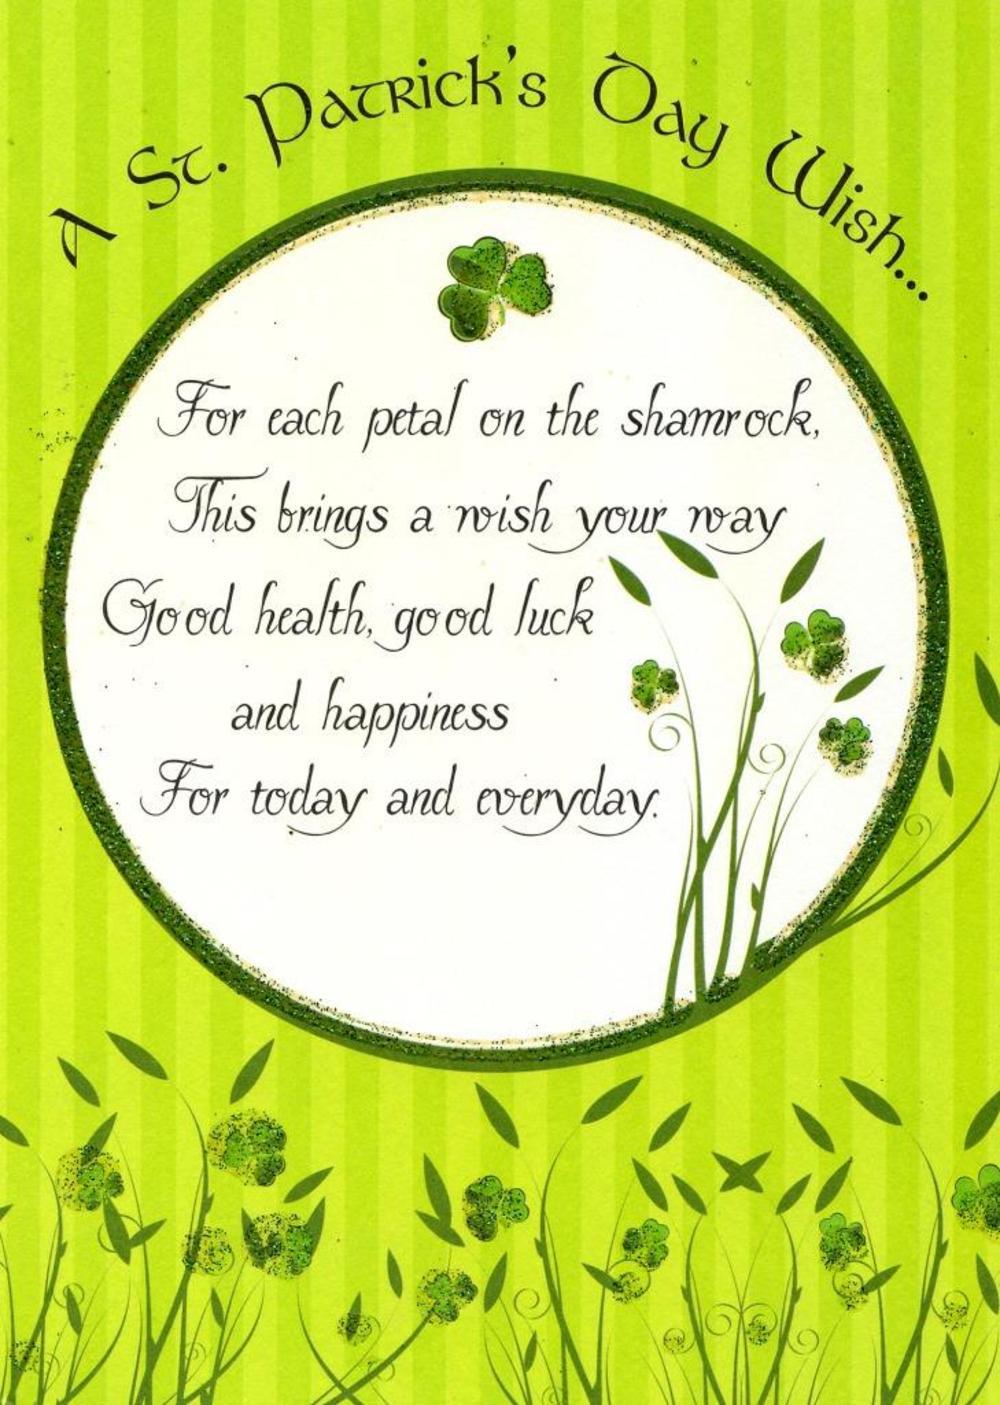 St Patricks Day Wish Greeting Card Cards Love Kates